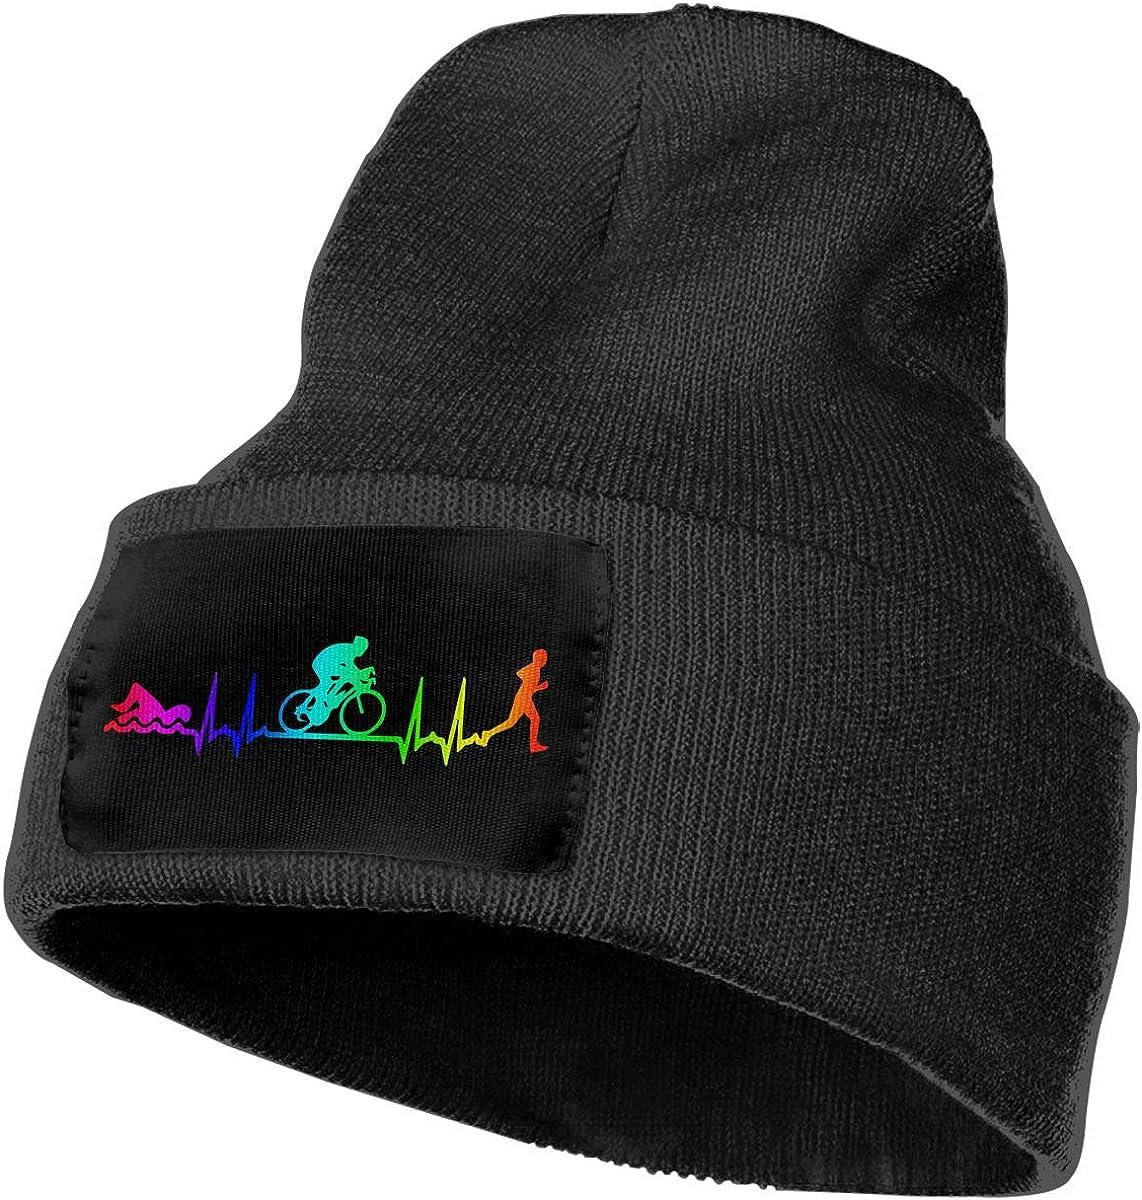 Men /& Women Triathlon Heartbeat Outdoor Fashion Knit Beanies Hat Soft Winter Skull Caps